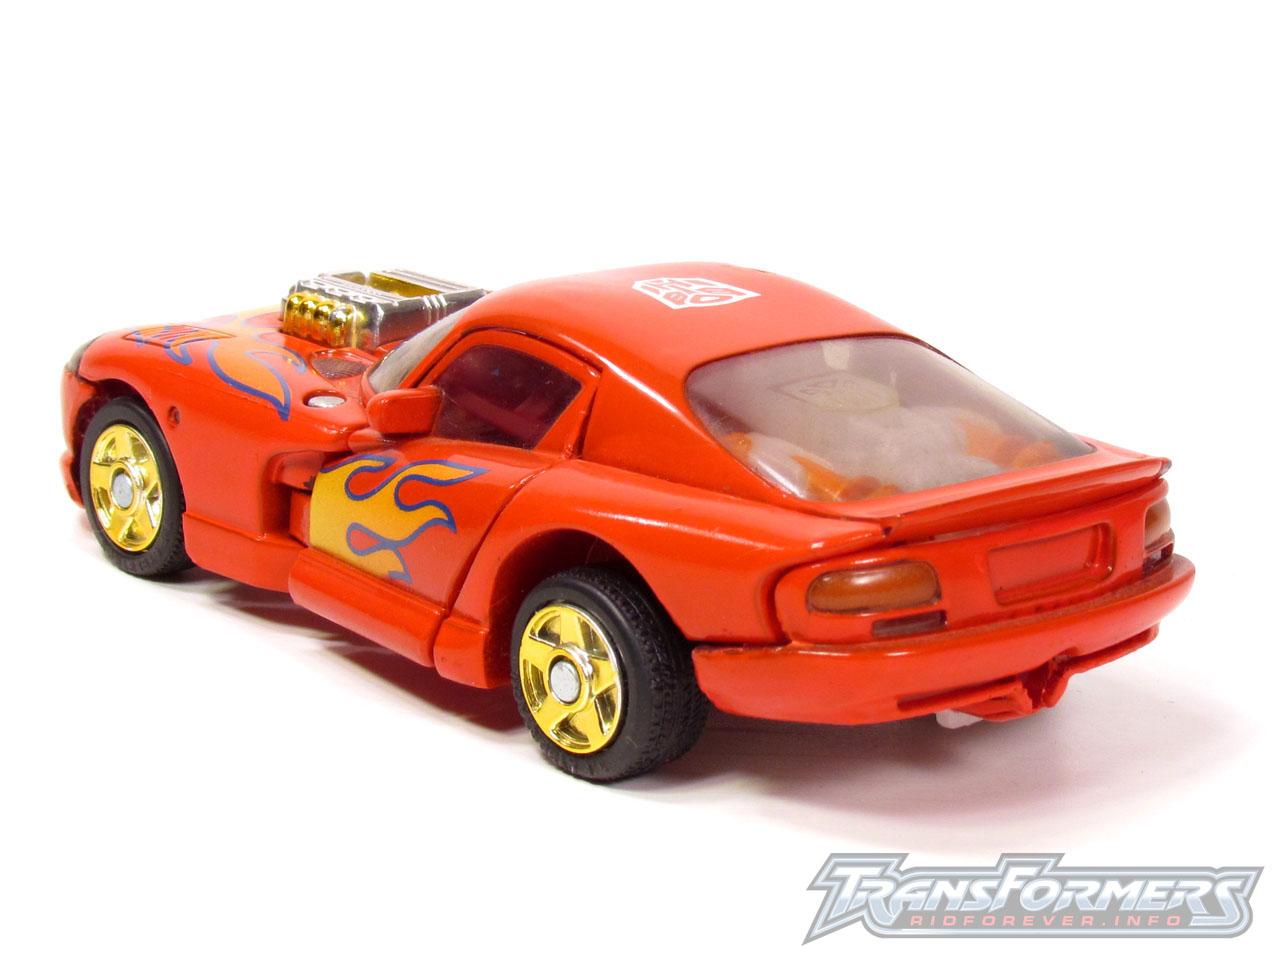 Sideburn Super 004